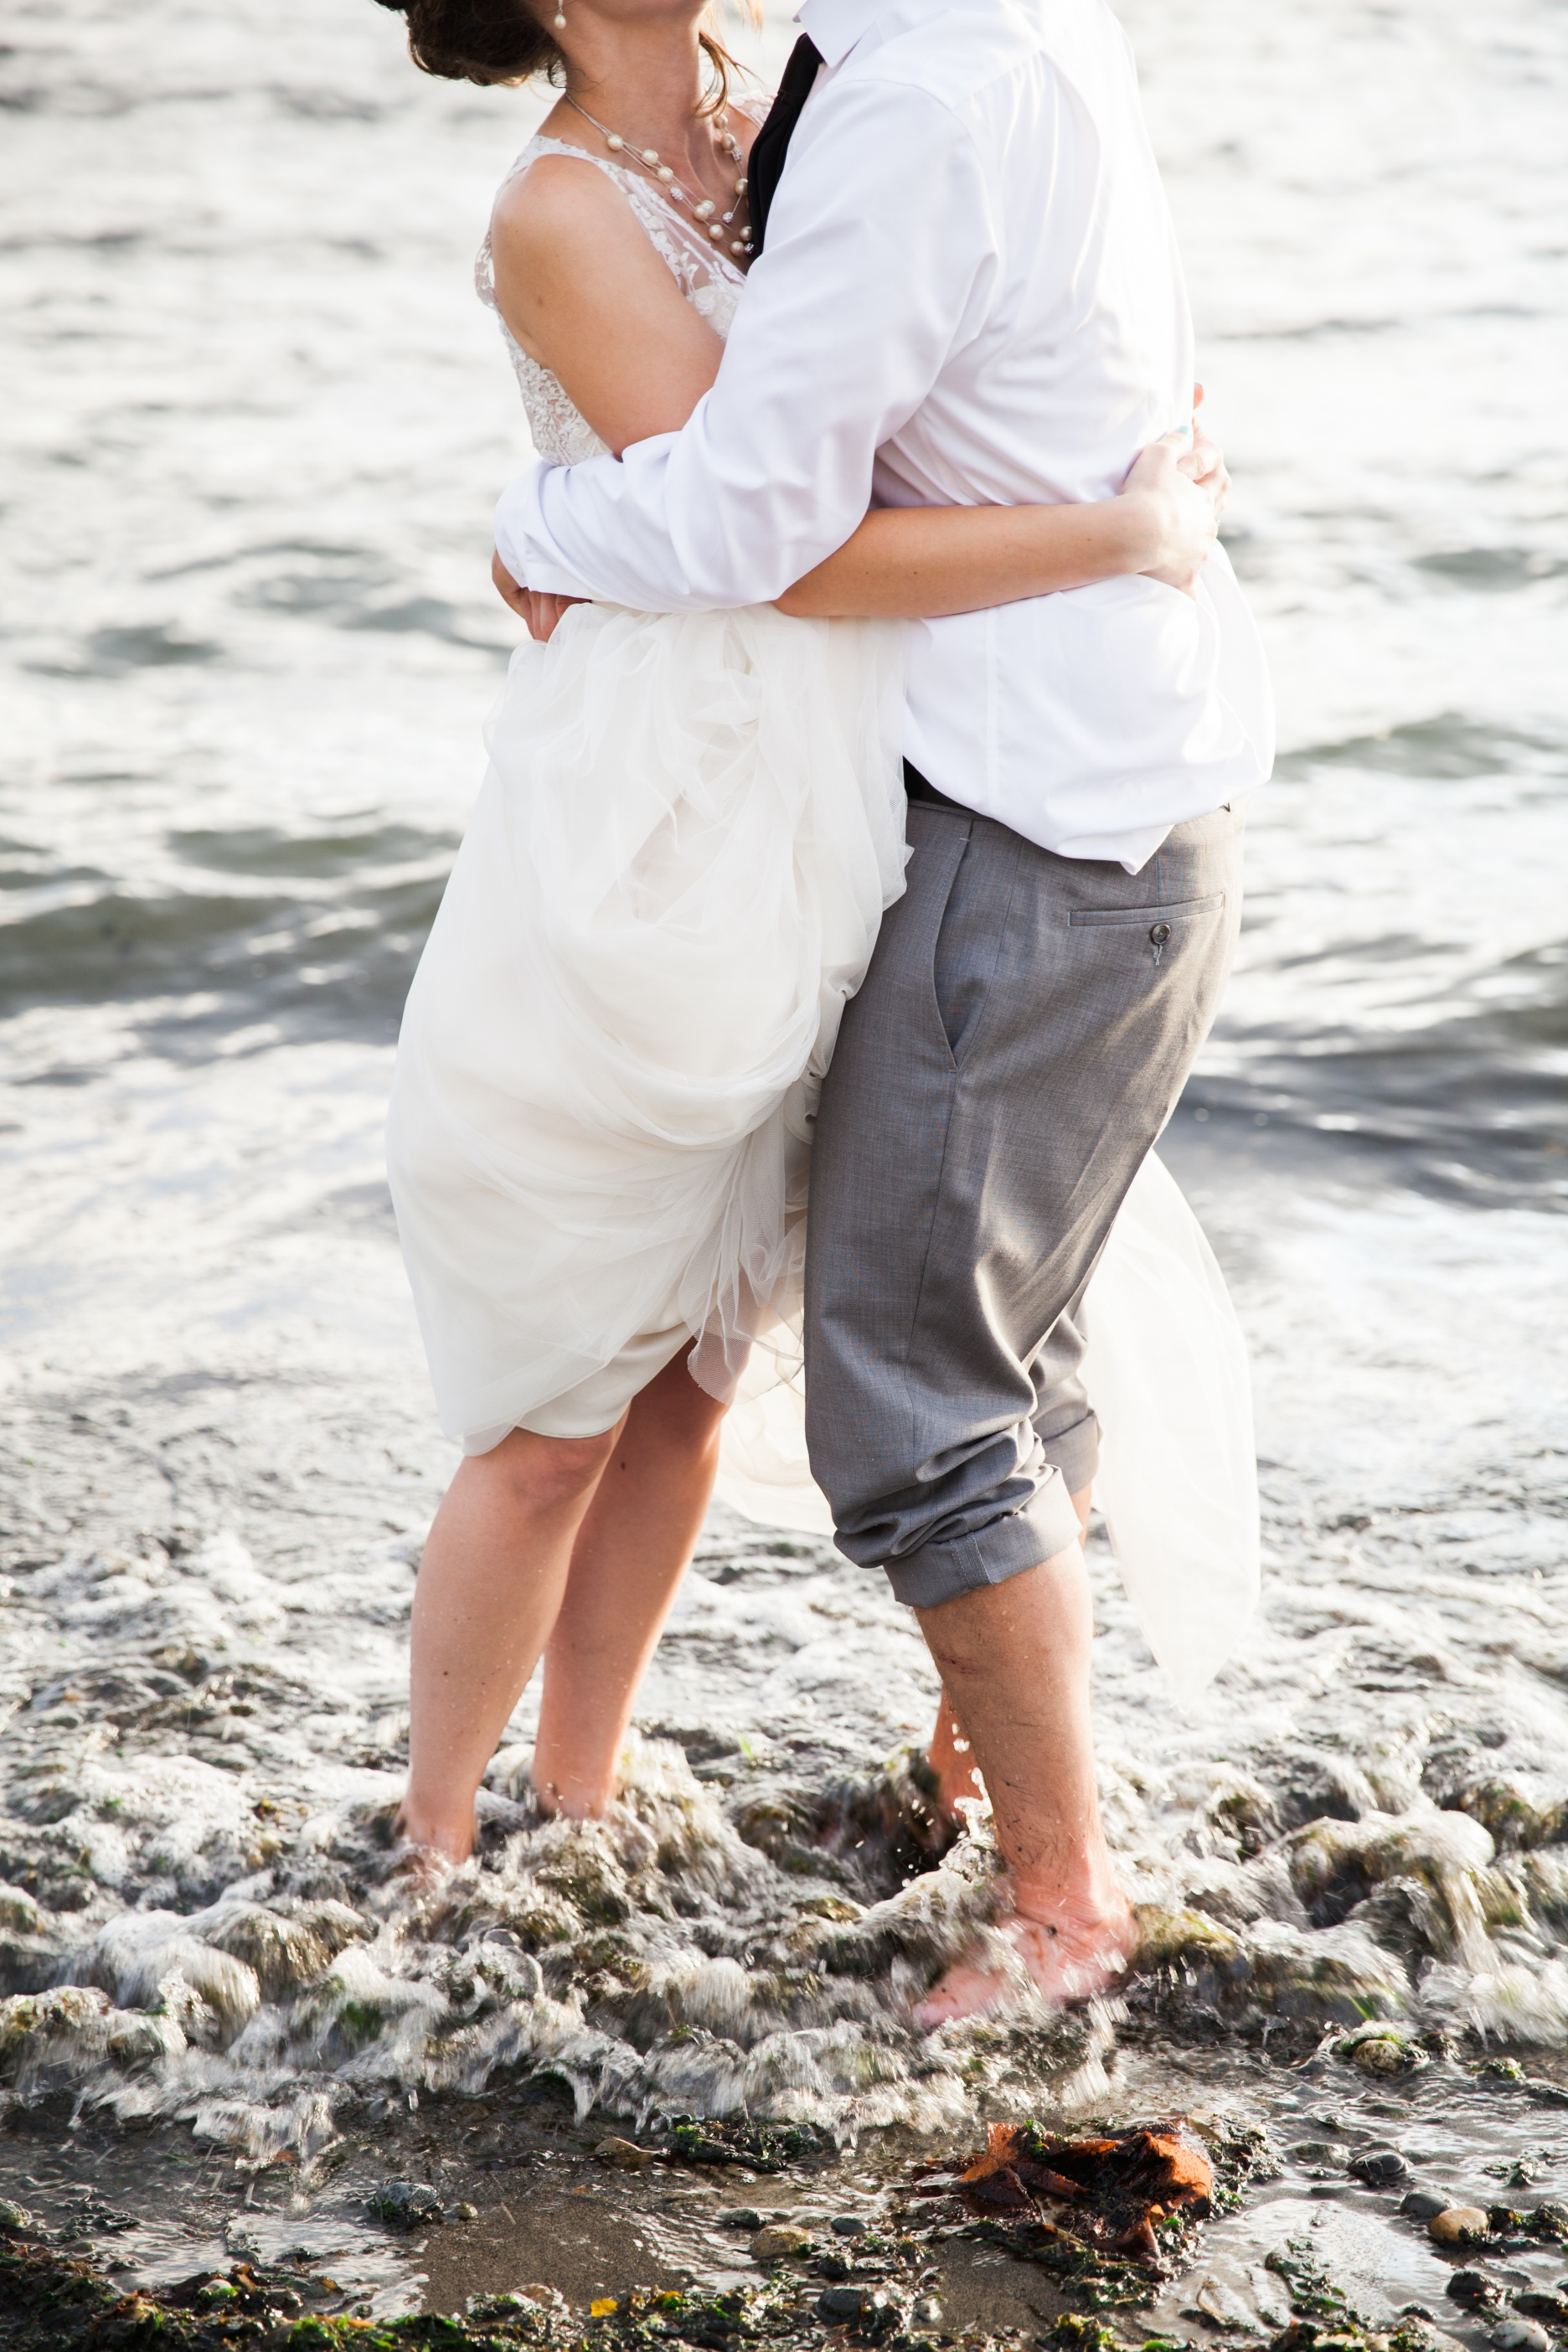 seattle wedding photographer film photography golden garden gardens state park ocean sand bride groom 44.jpg